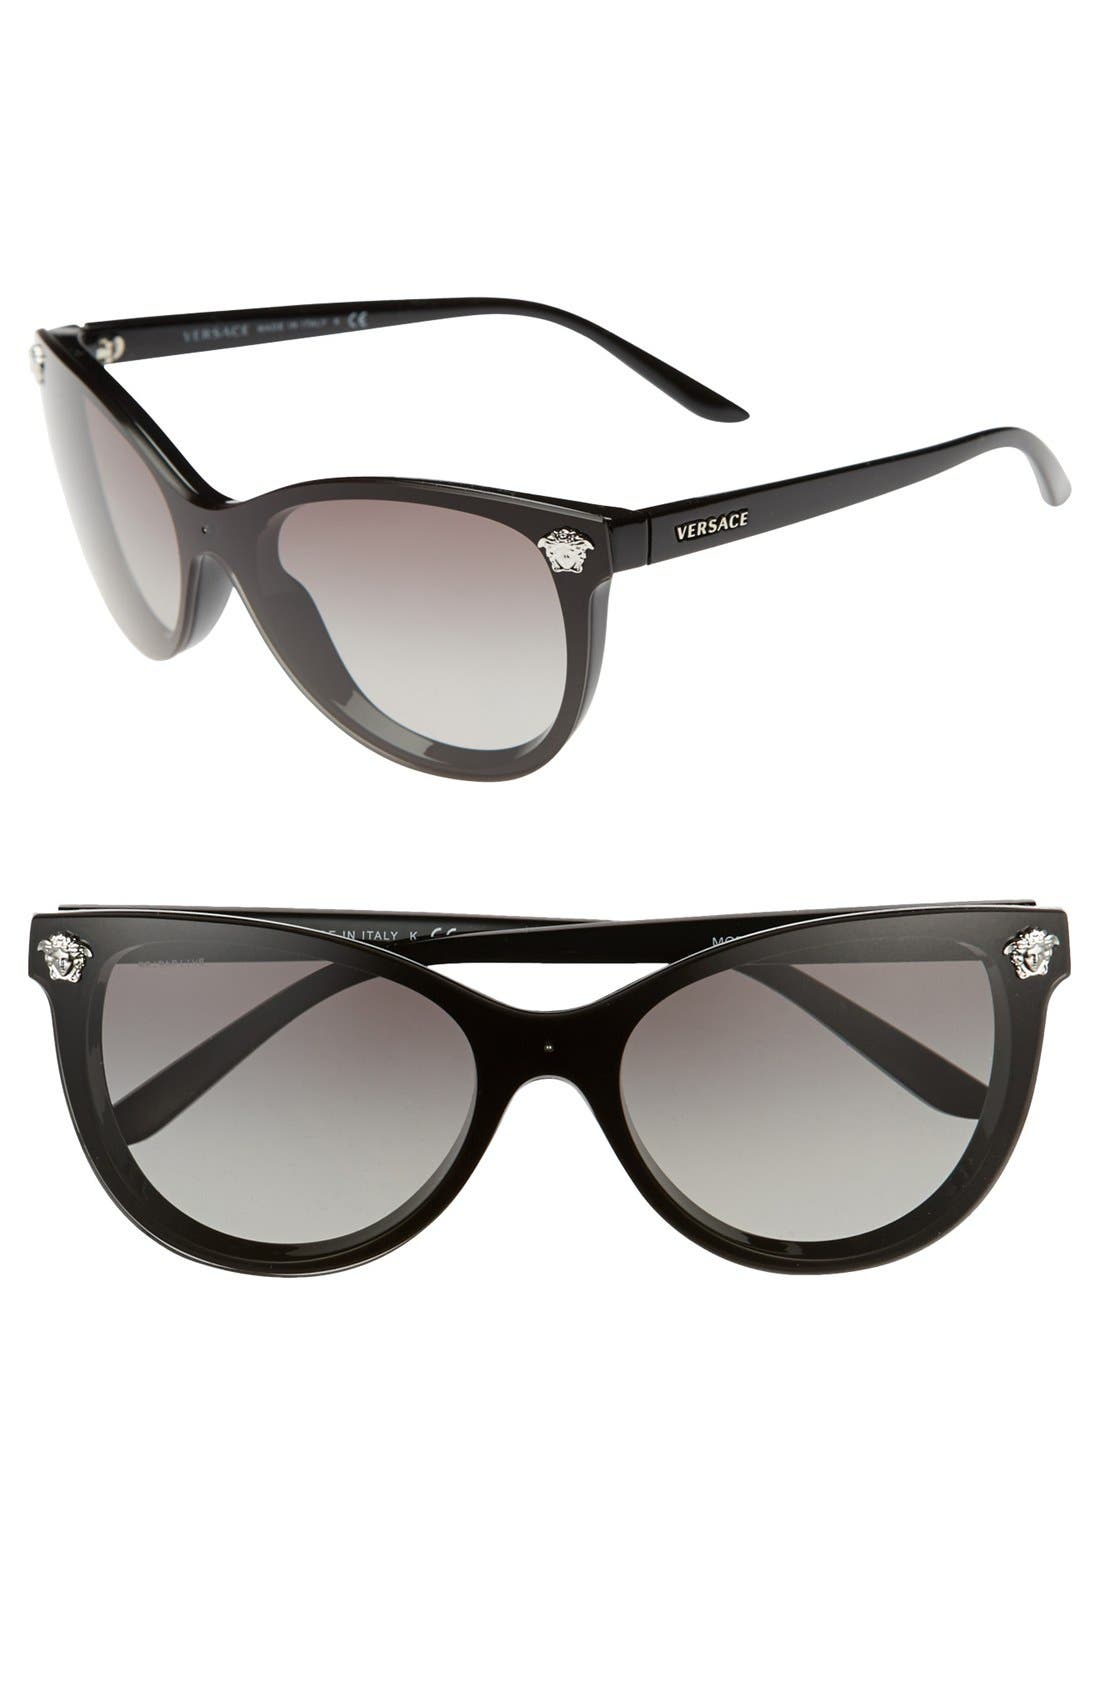 Main Image - Versace 'Rock Icons' 57mm Cat Eye Sunglasses